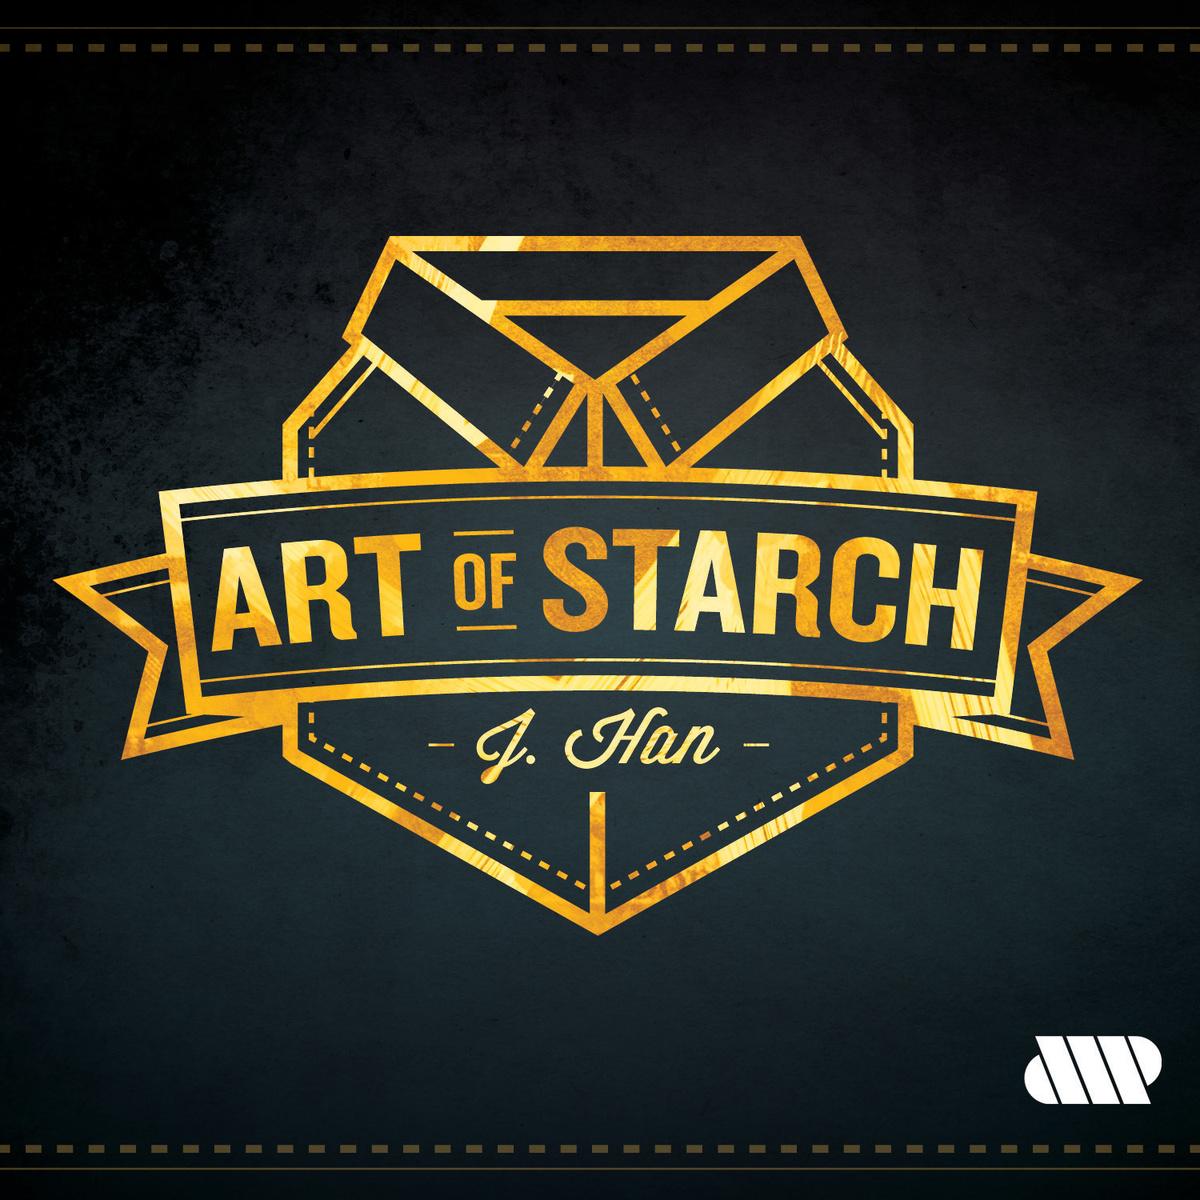 J. Han - Art of Starch